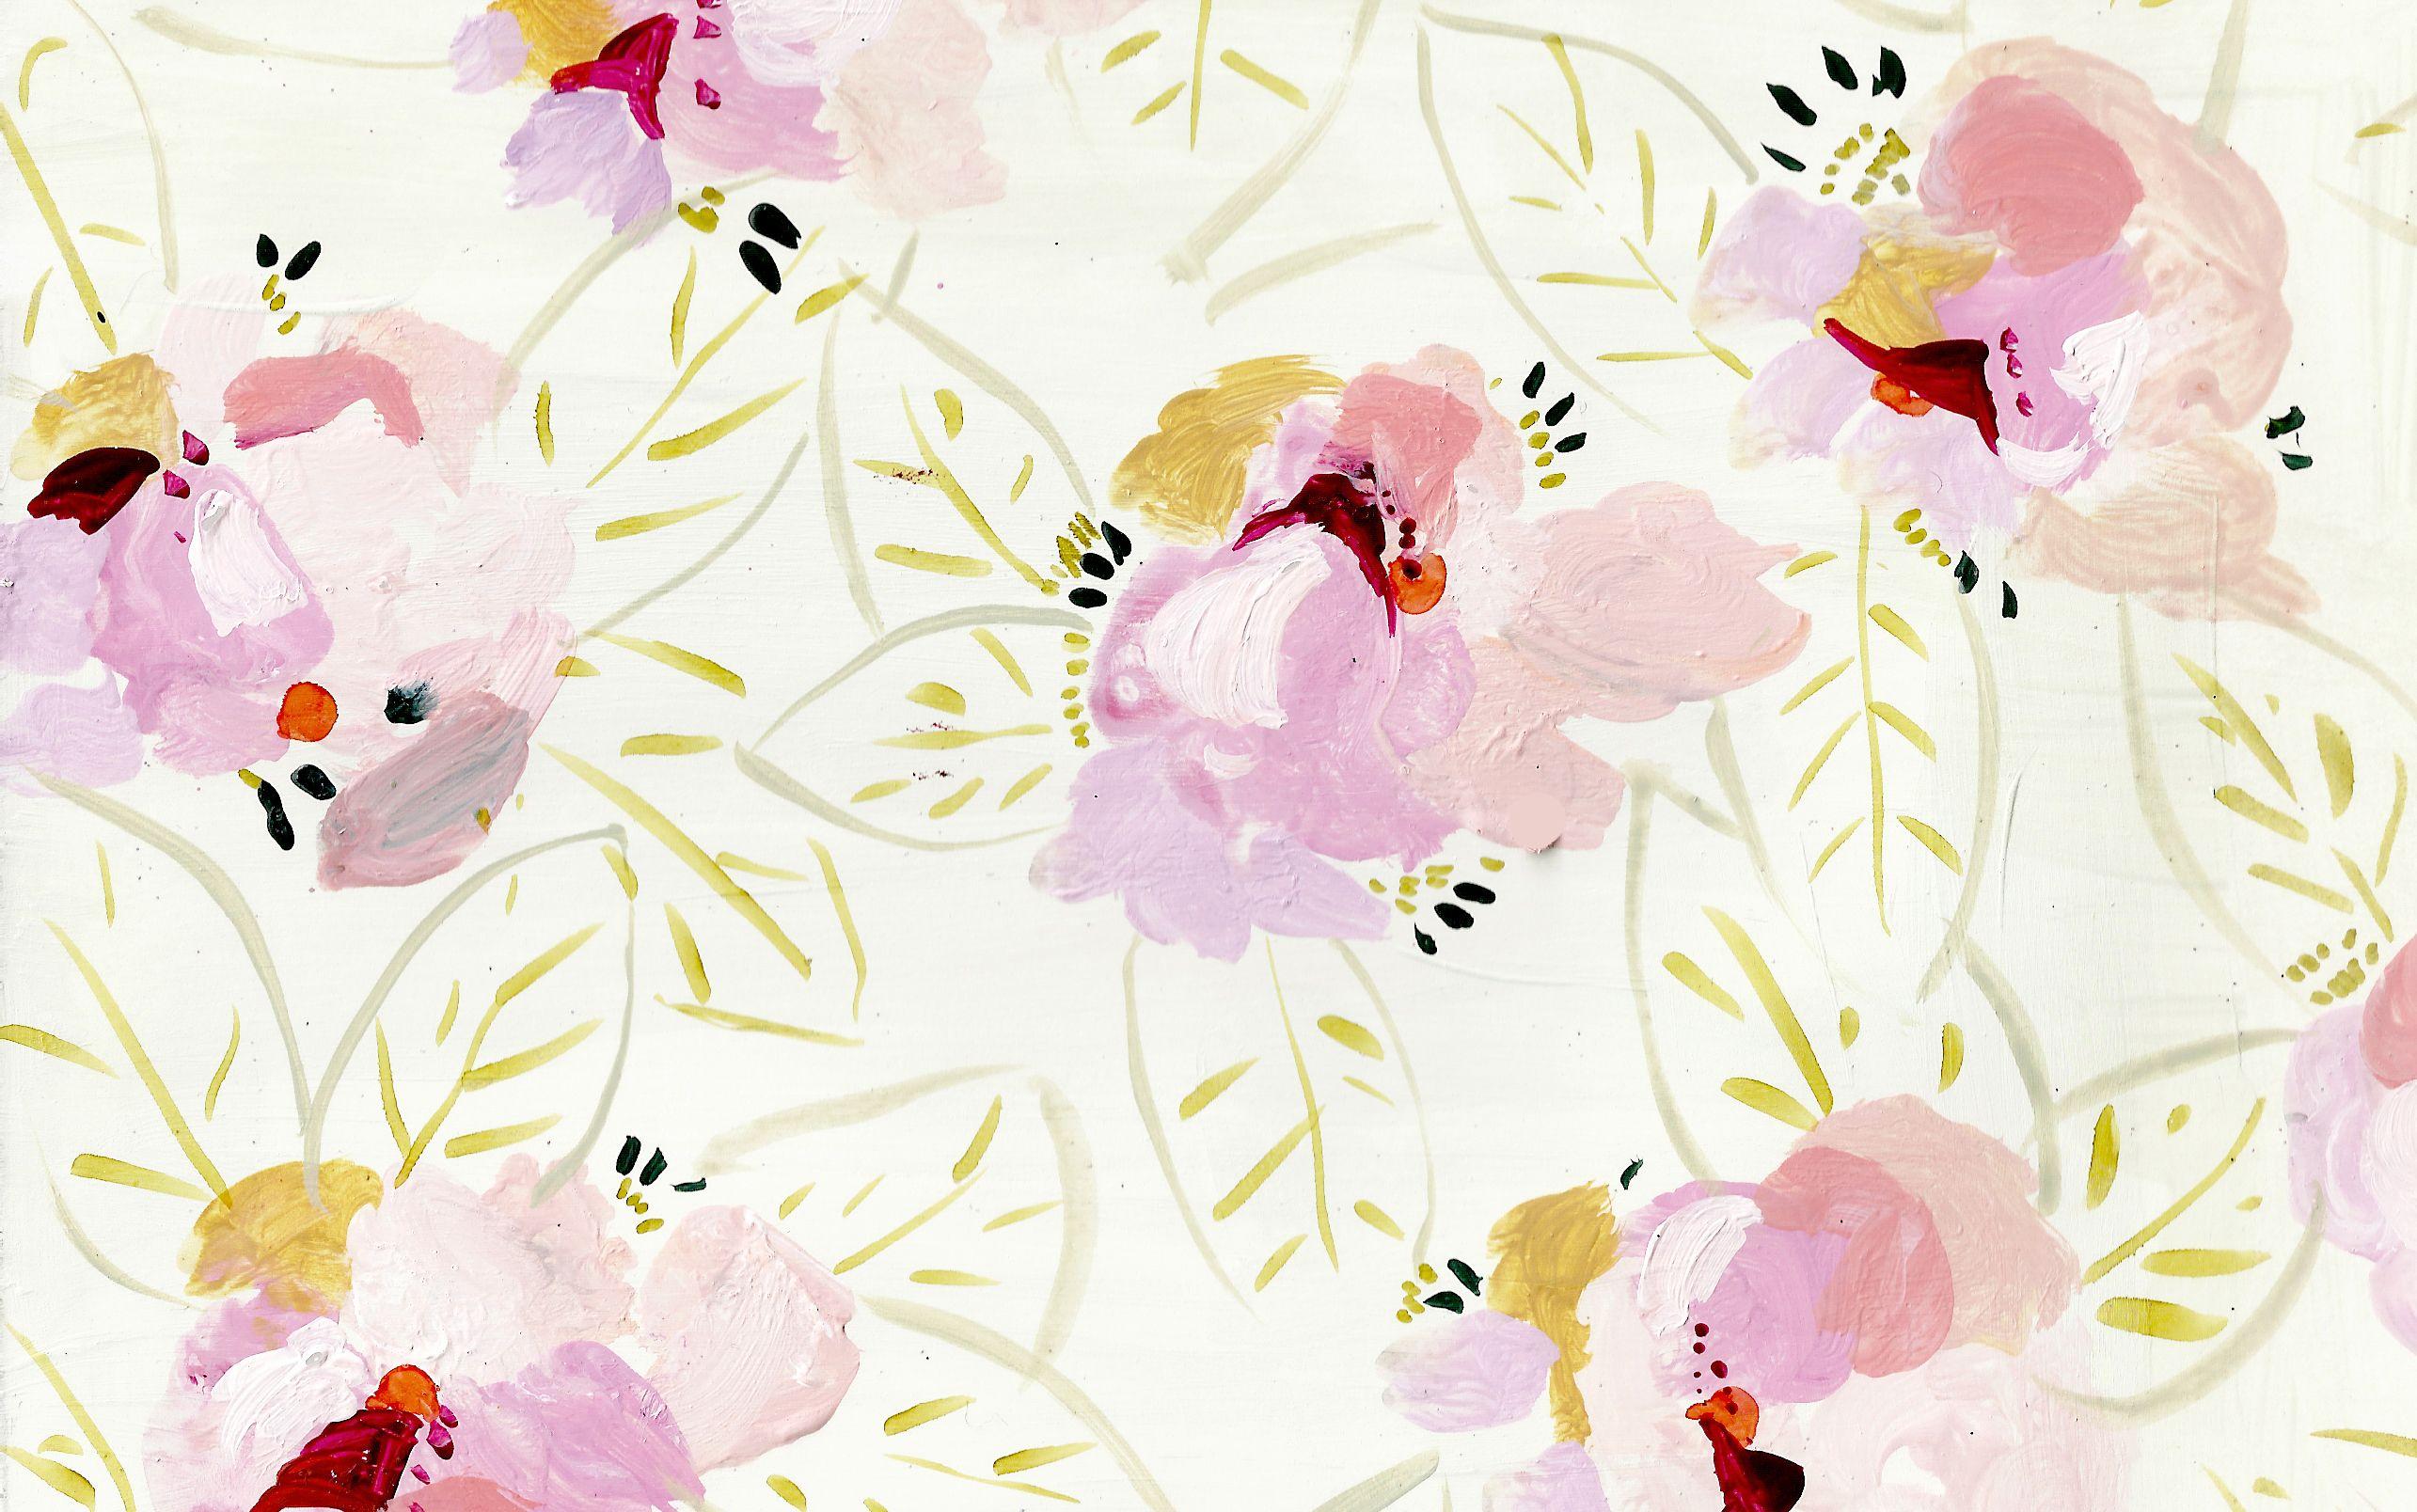 Tropicalflowers2 Jpg 2 570 1 608 Pixels Kate Spade Wallpaper Pattern Art Prints